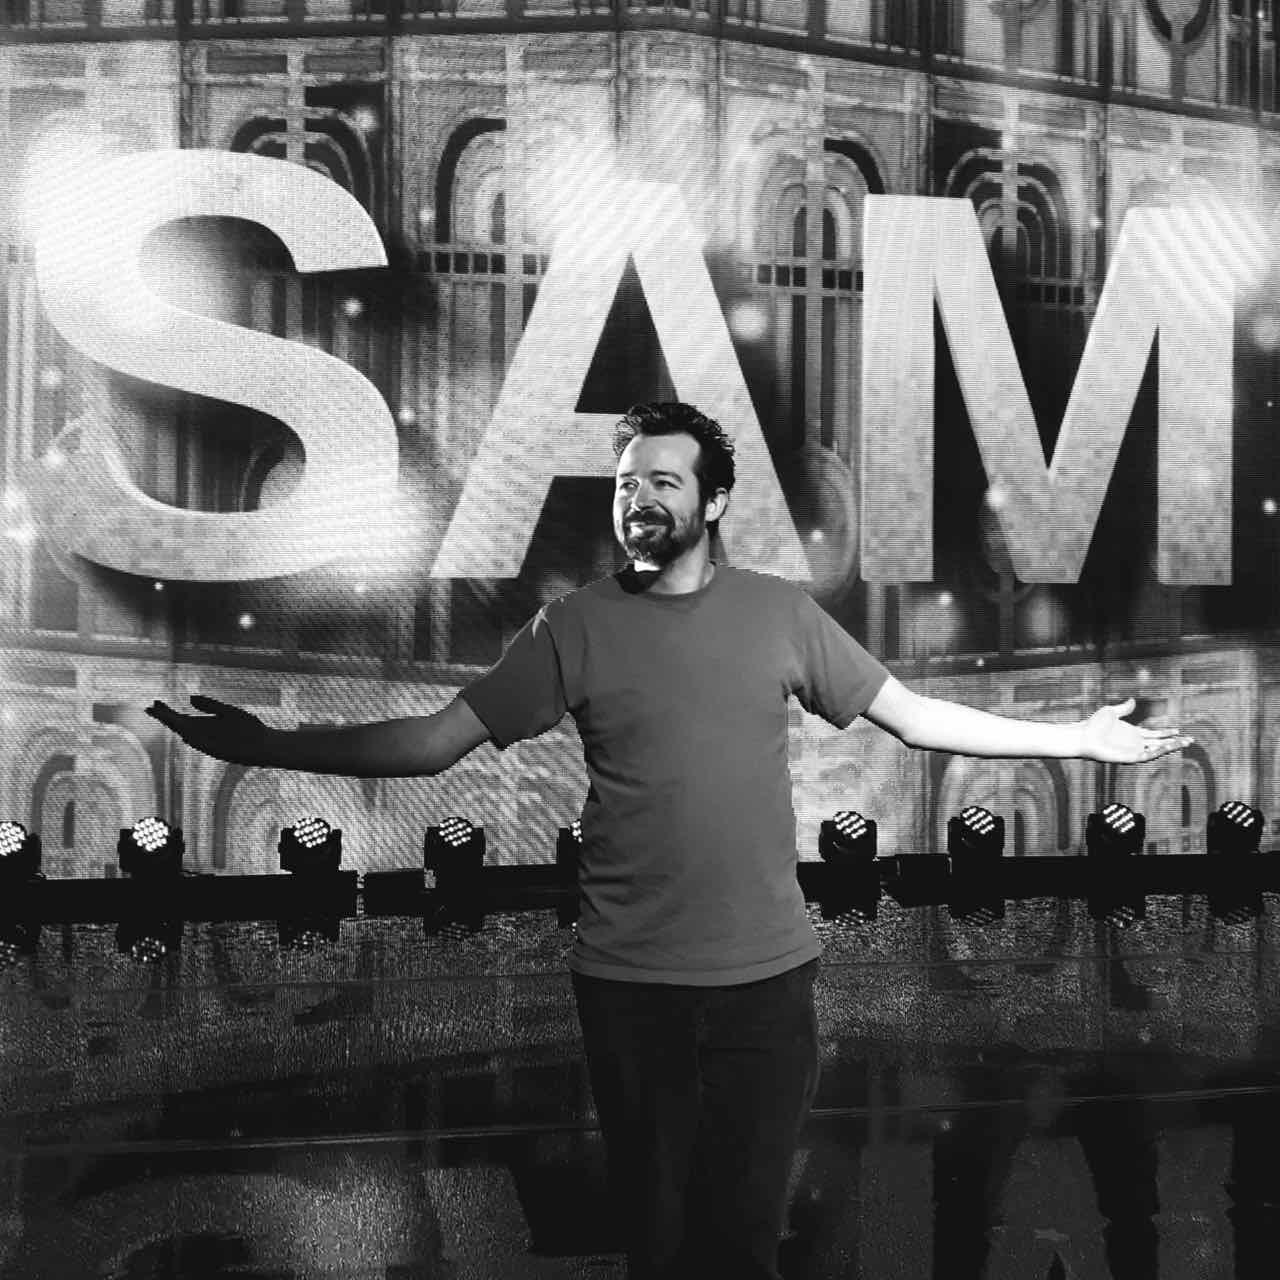 Sam Smith: Live in Concert